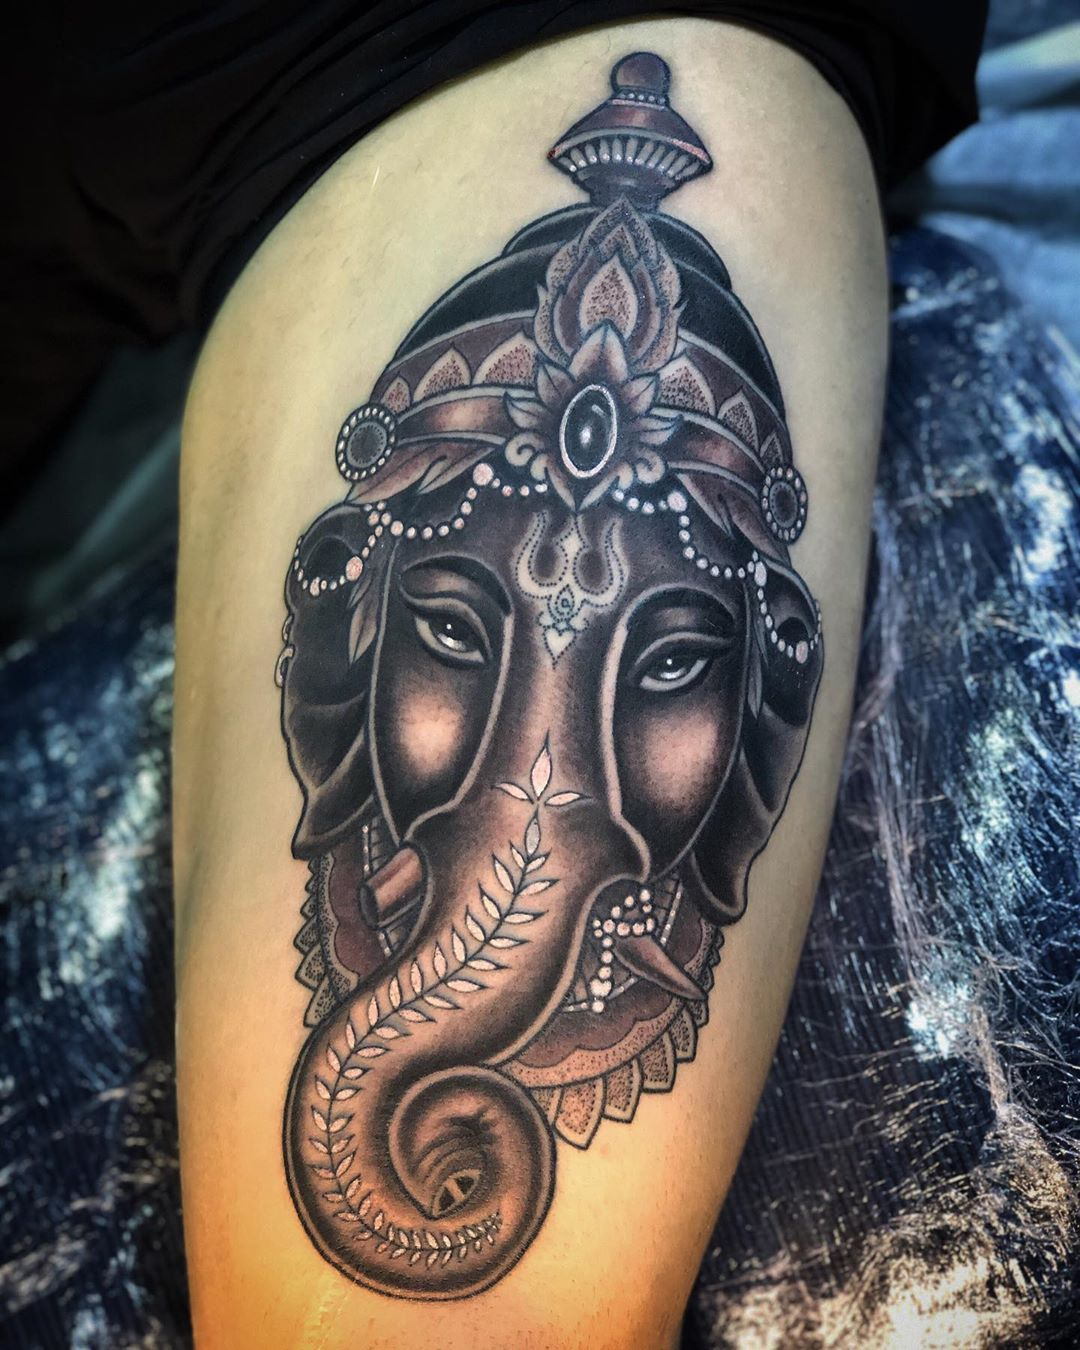 Tatouage De Ganesh Tatouage Tatouage Ganesh Ganesh